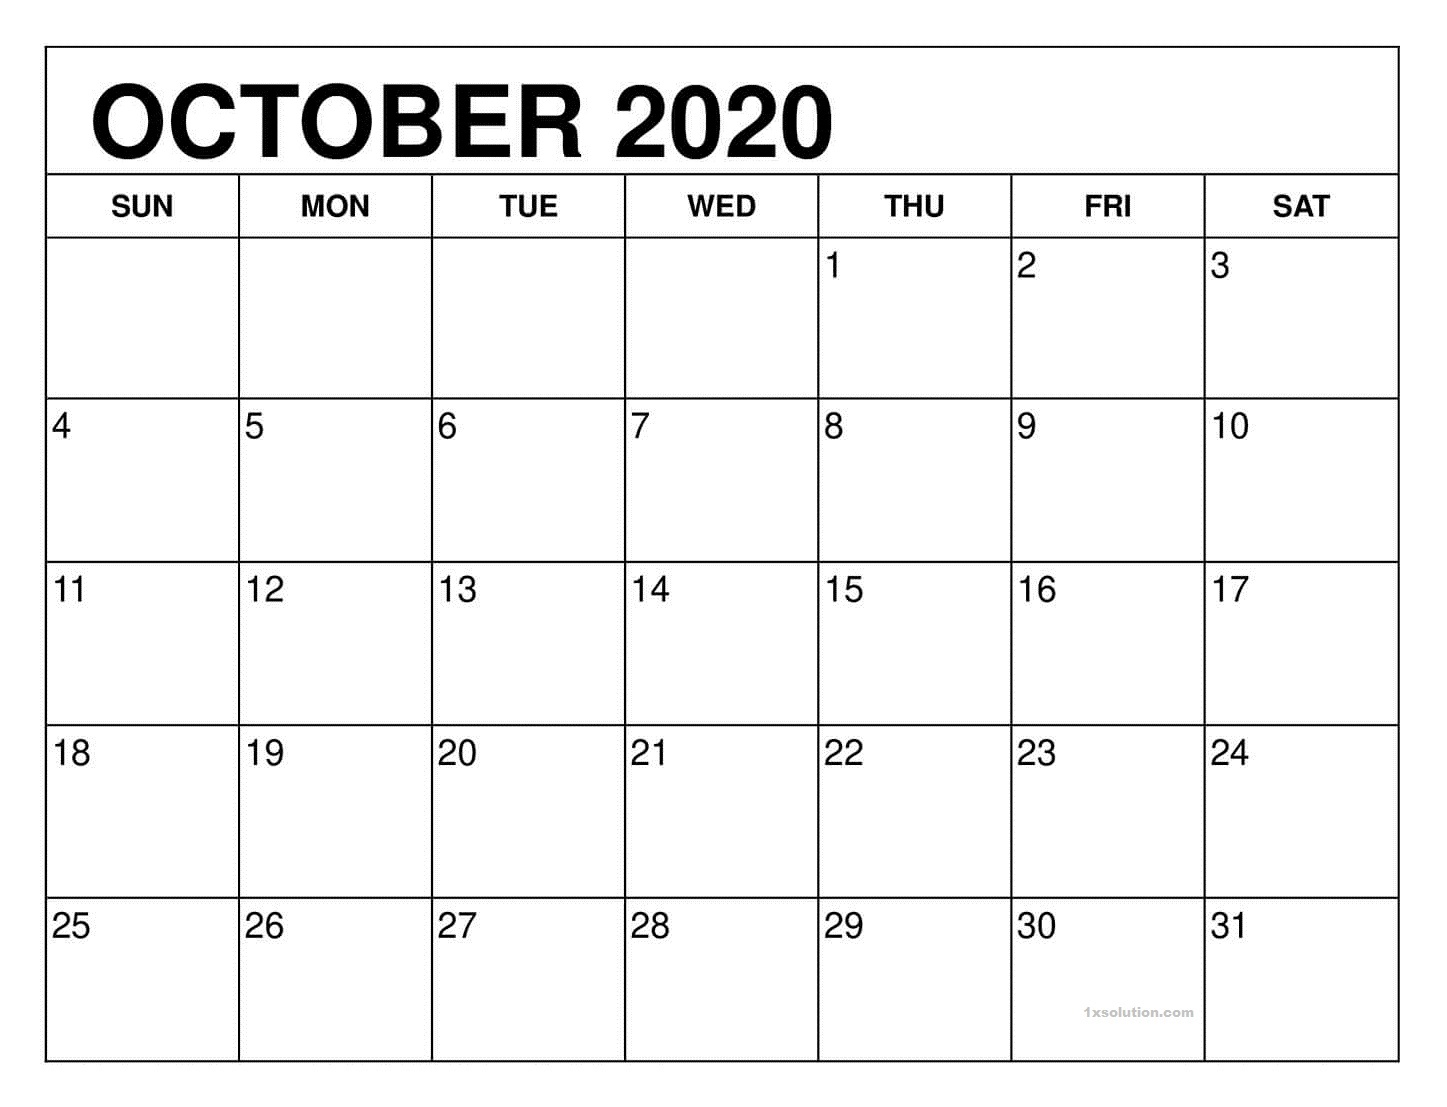 October Calendar 2020 PDF